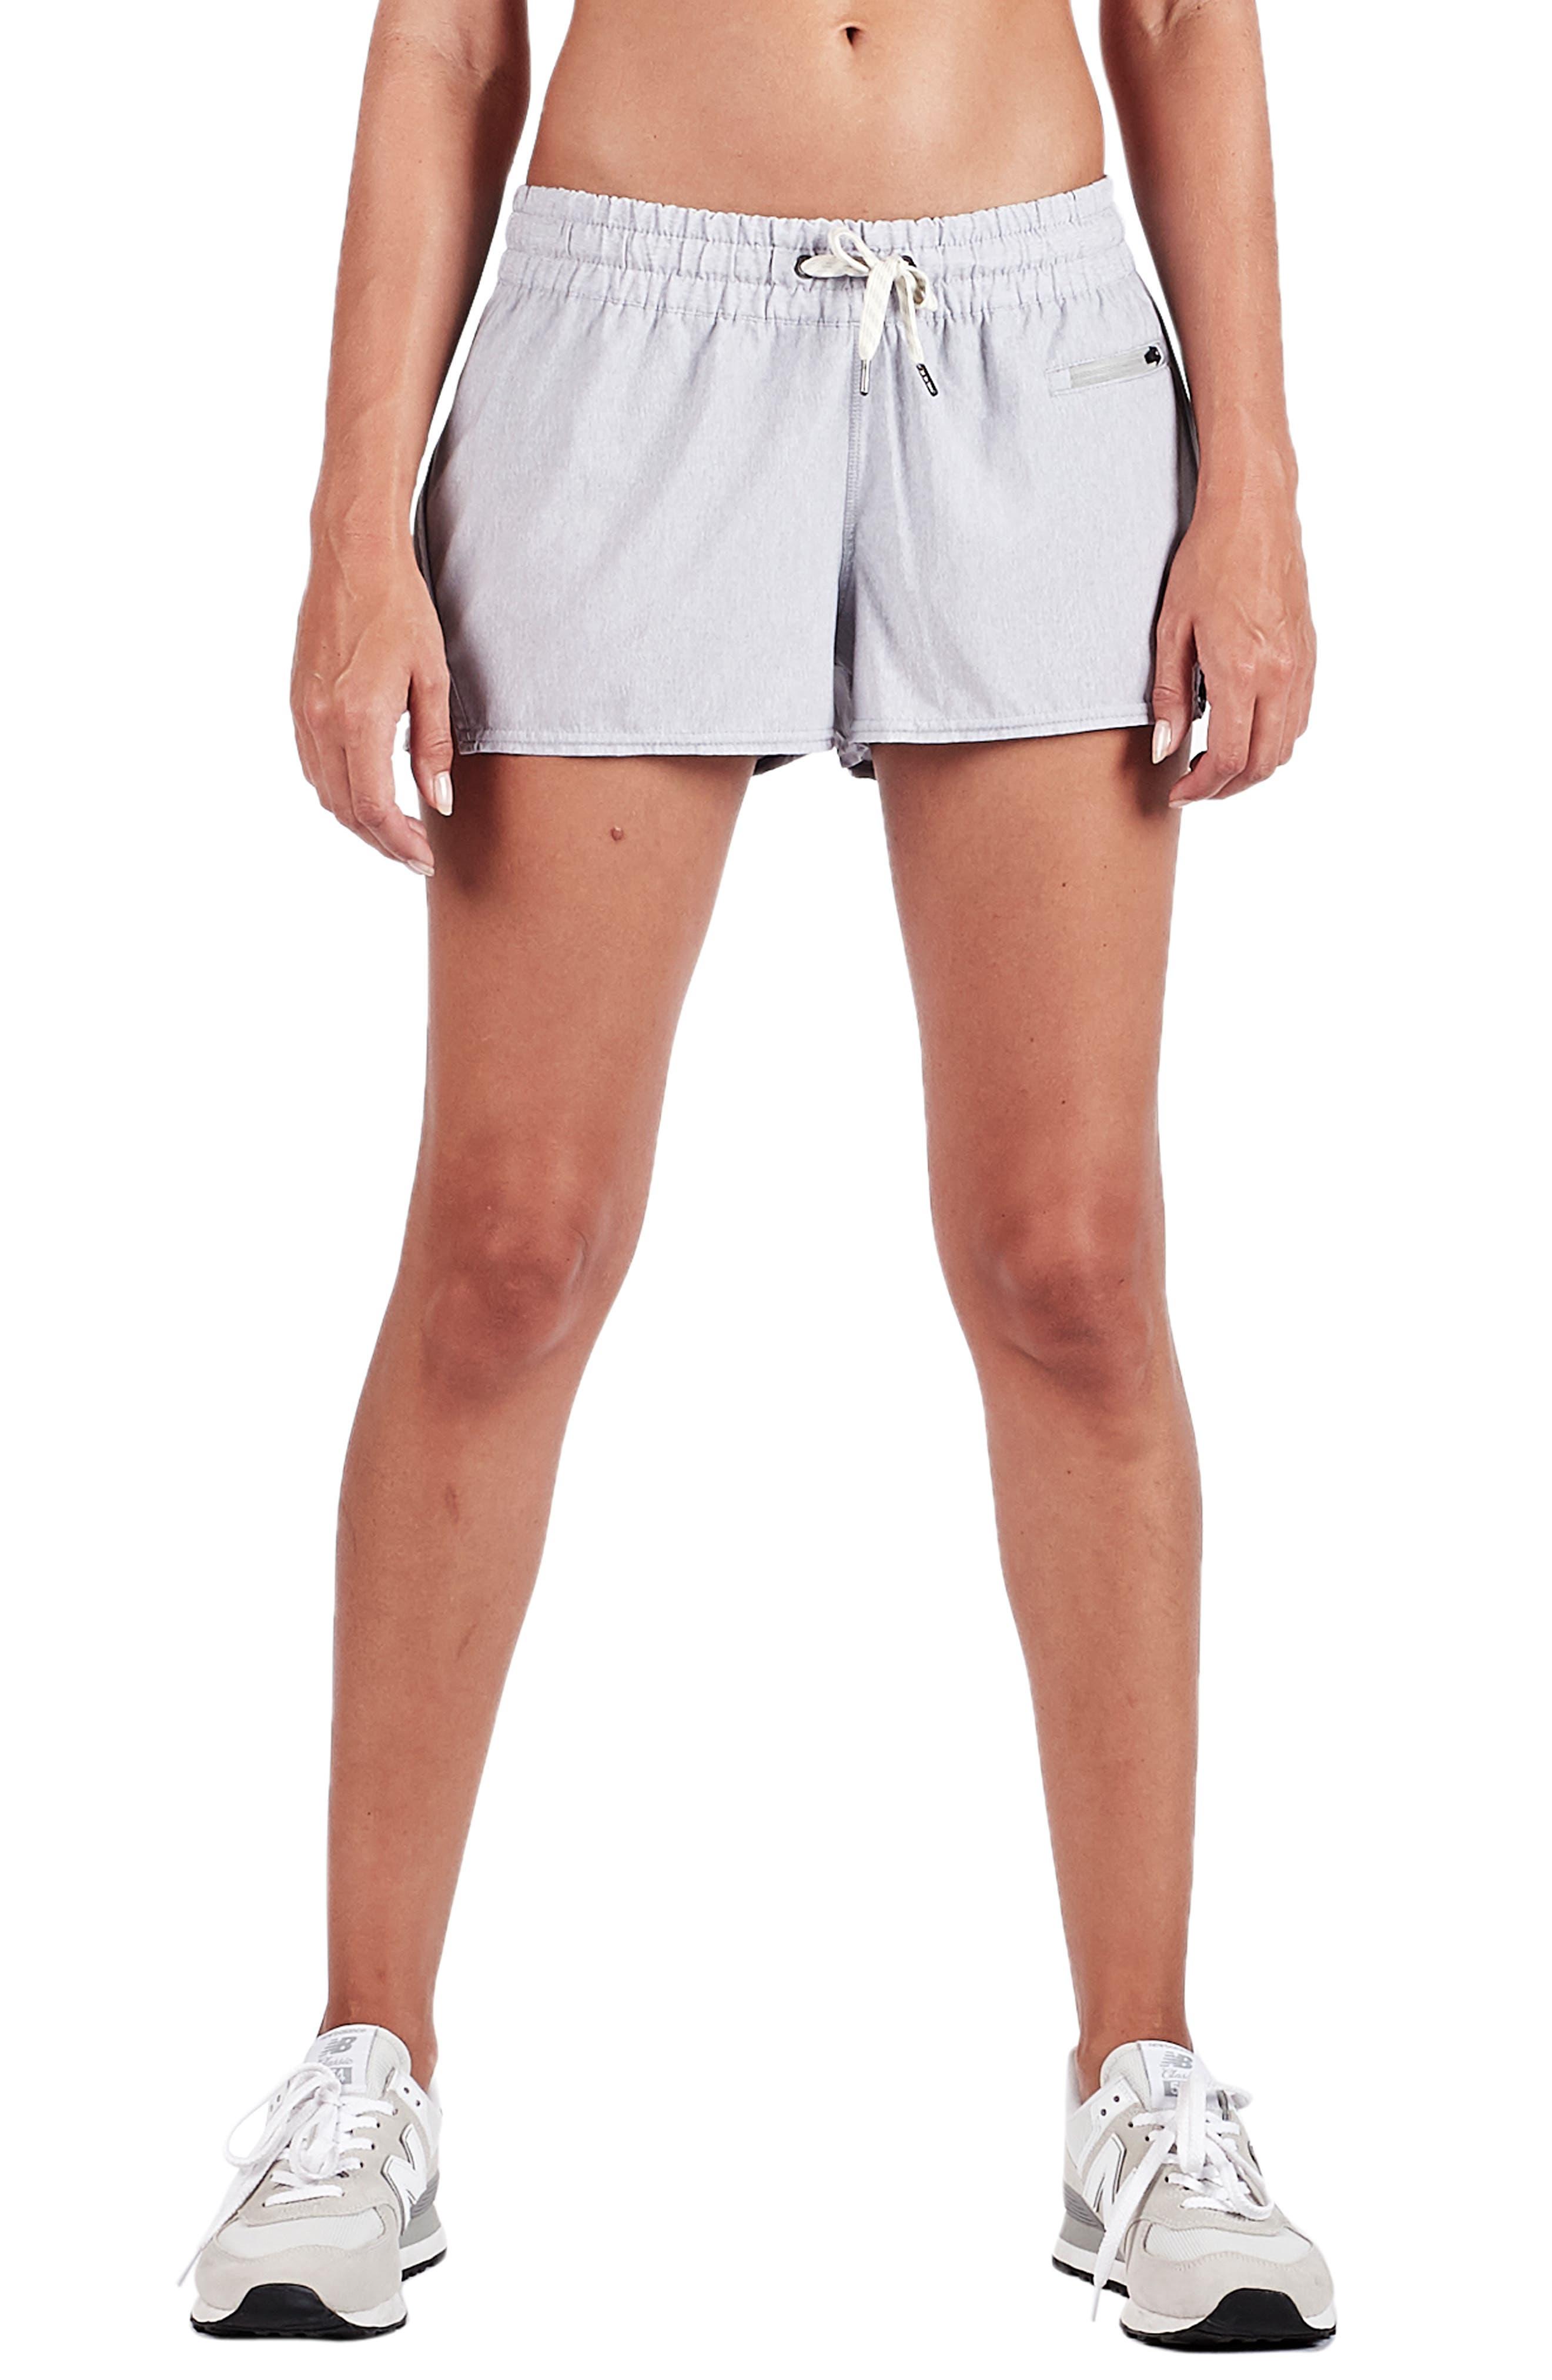 Vuori Clementine Shorts, Grey